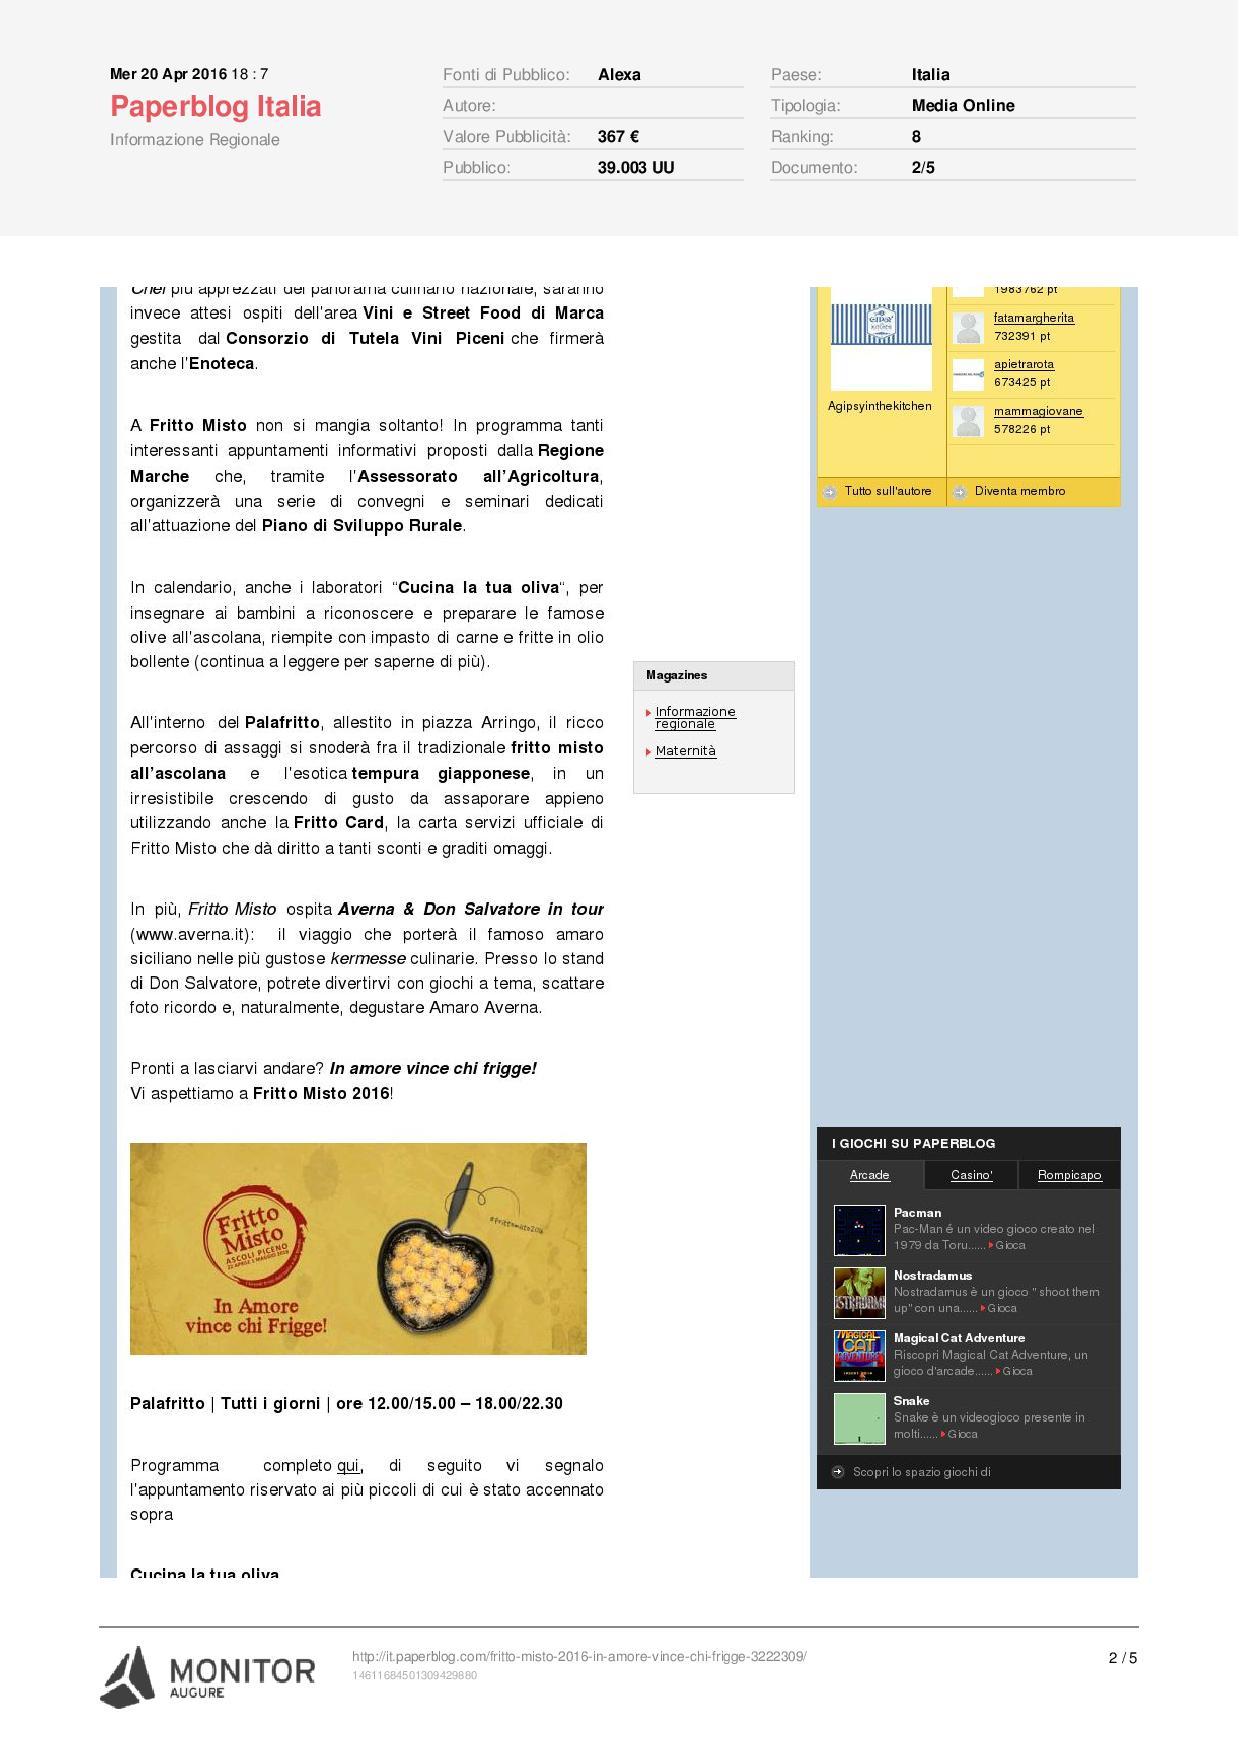 20.04.16_paperblog.com-page-002